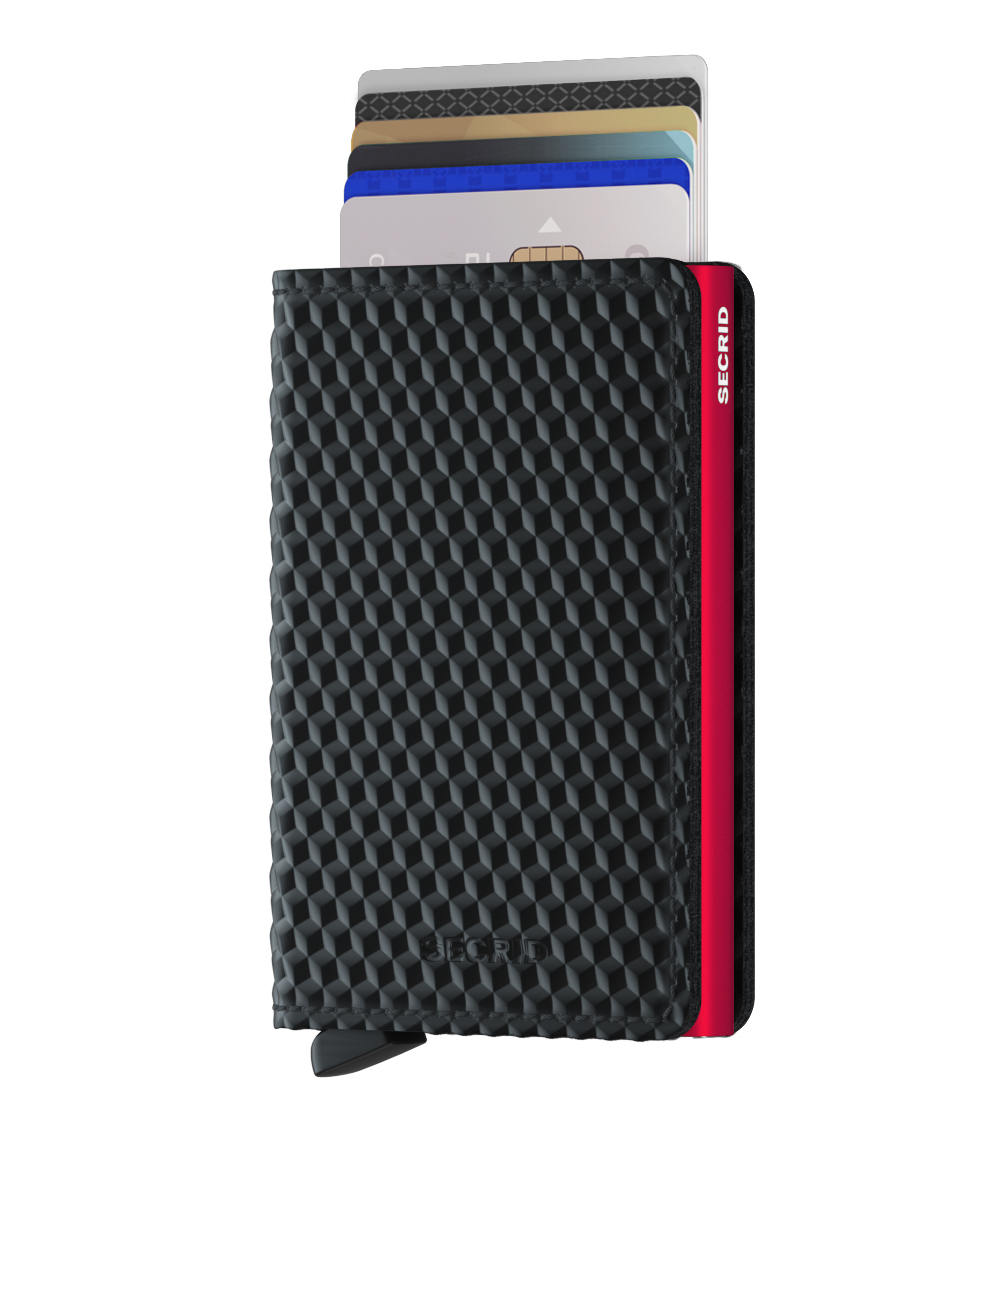 Secrid Slimwallet Cubic Black Red Cüzdan